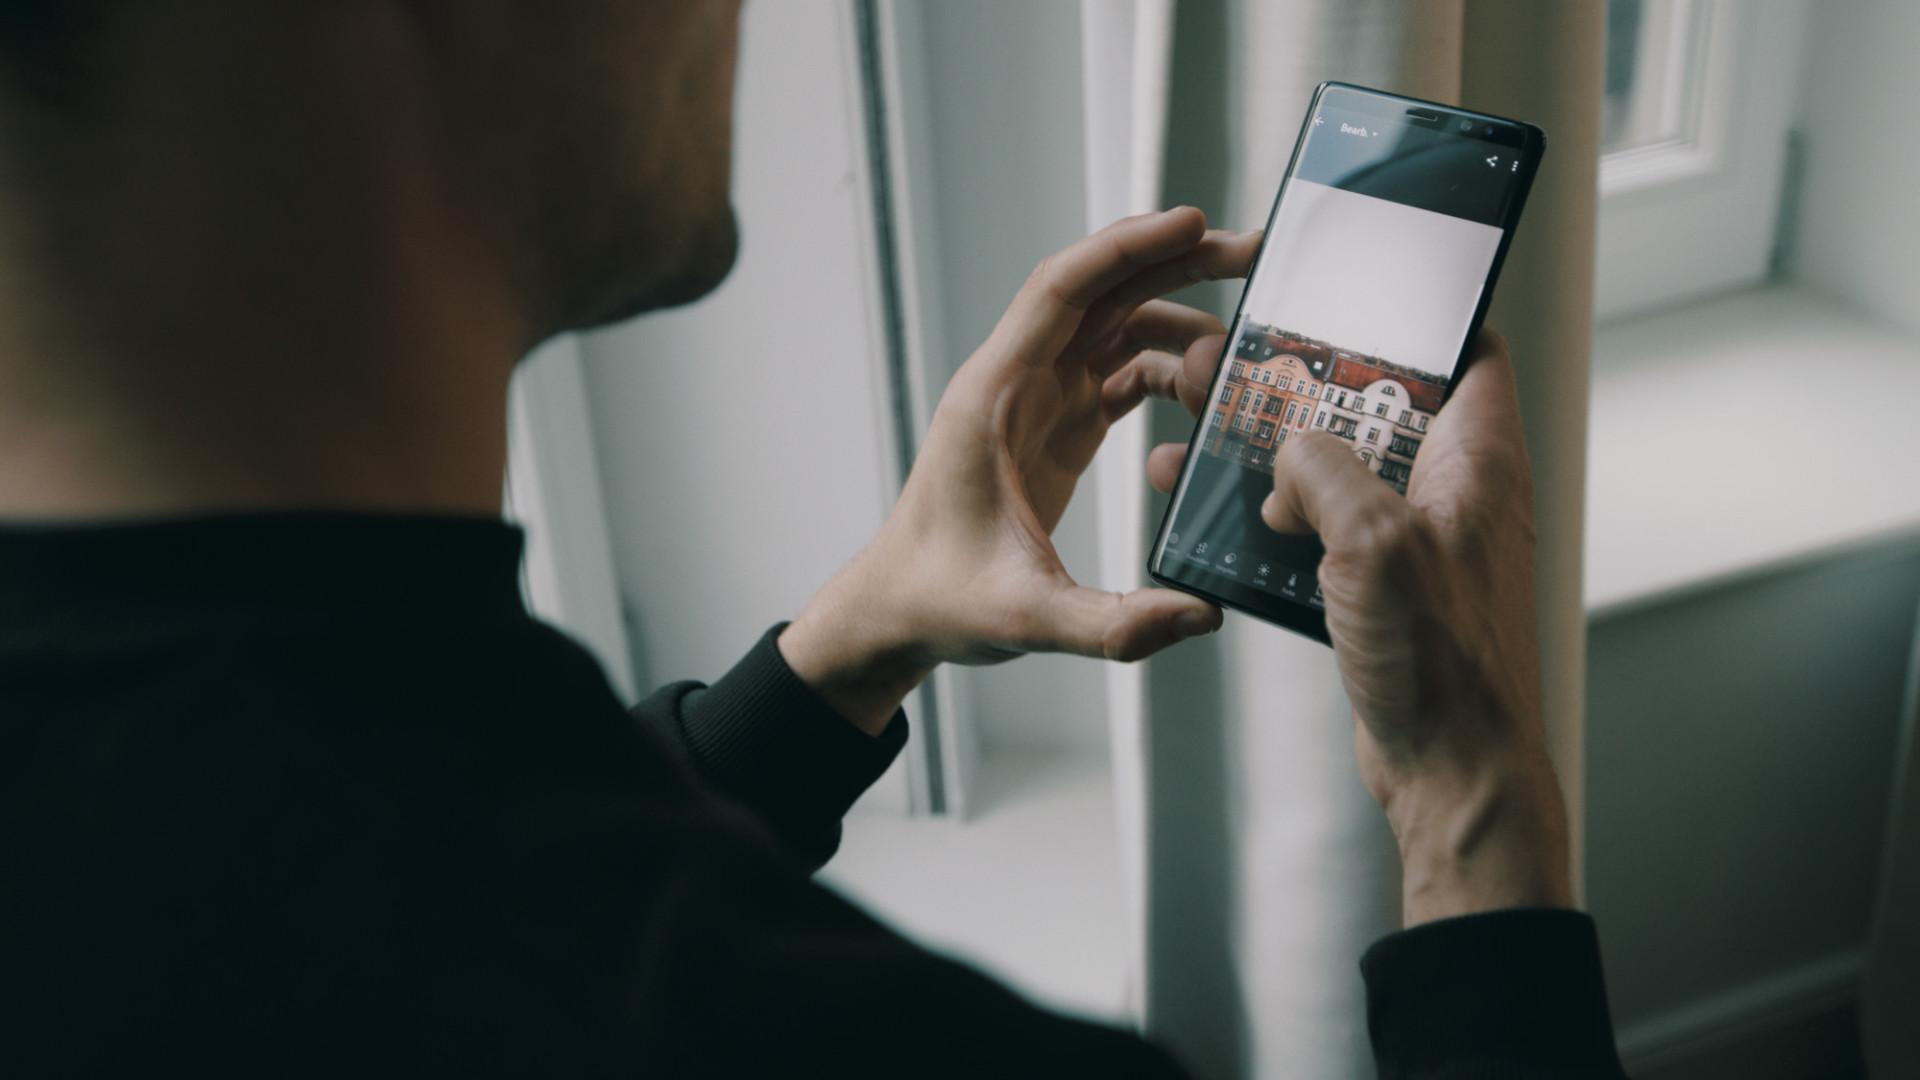 SCHMUTZ Thomas Kakareko | SAMSUNG Dex X Adobe Lightroom Mobile